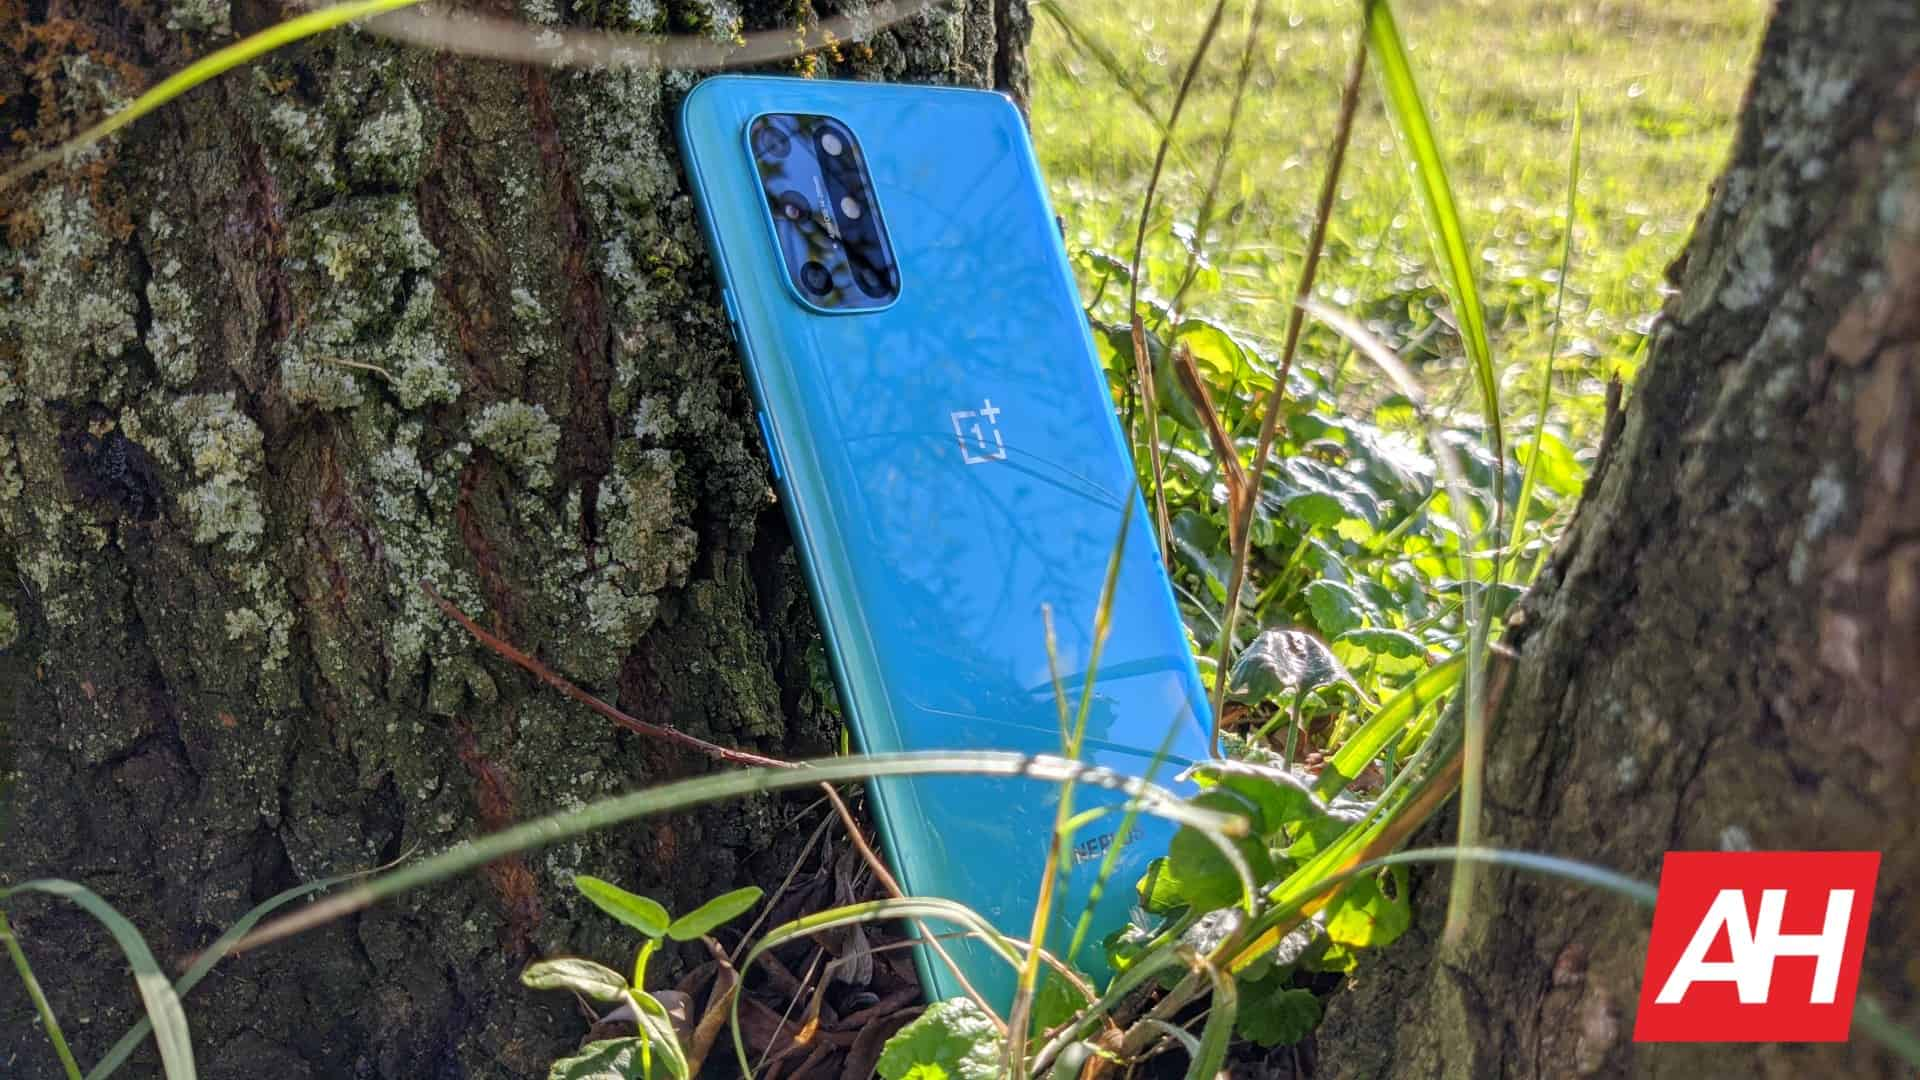 AH OnePlus 8T image 911